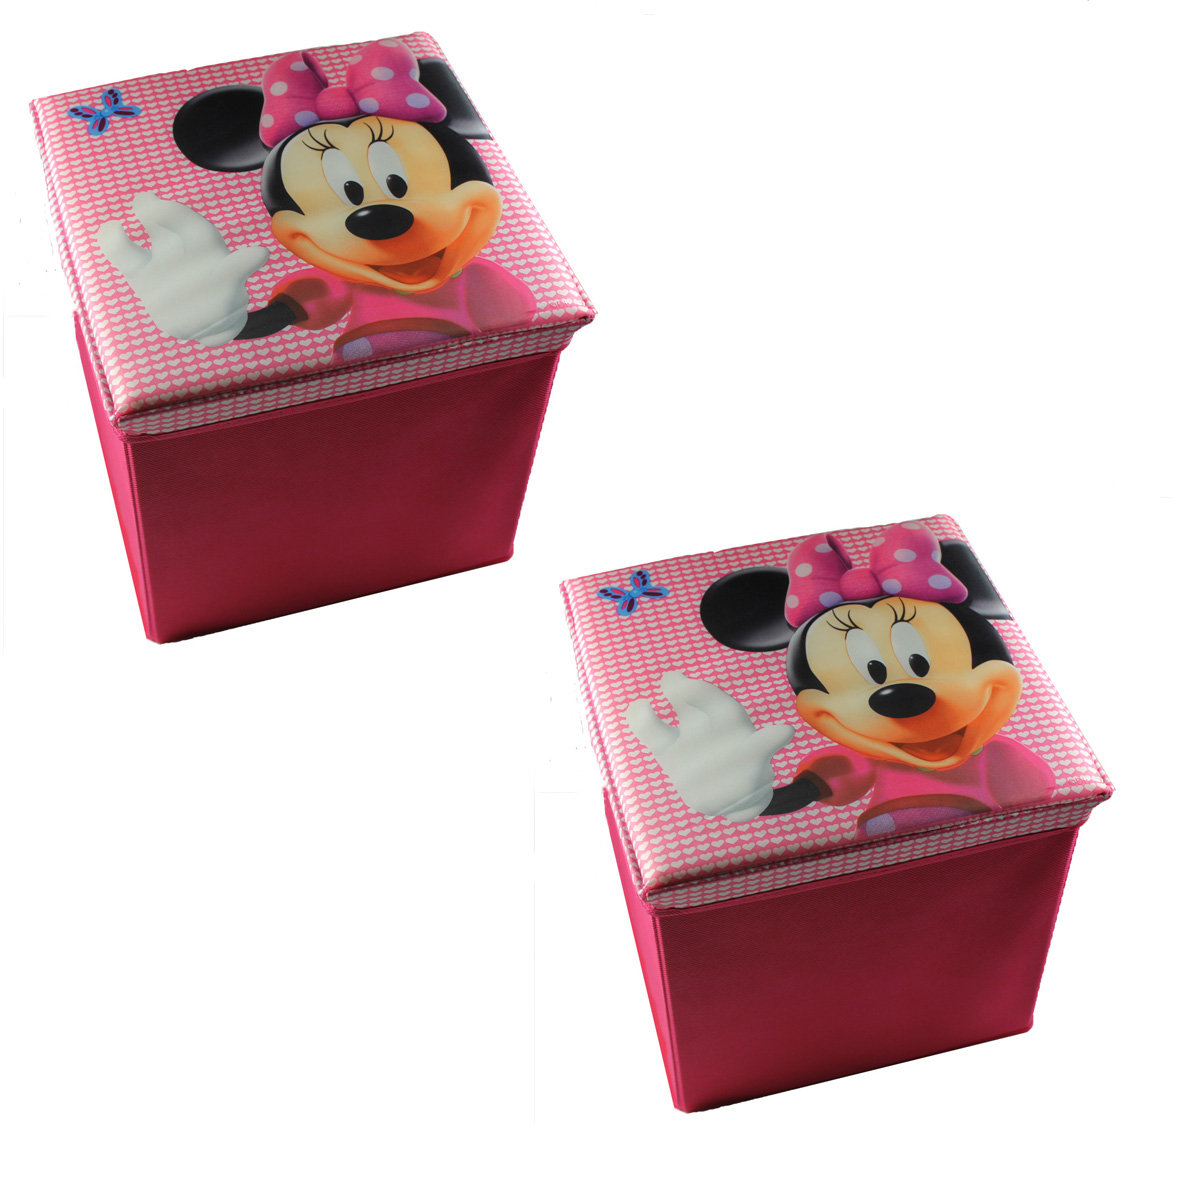 Full Size of Aufbewahrungsboxen Kinderzimmer Amazon Holz Mint Design Aufbewahrungsbox Ebay Stapelbar Mit Deckel Ikea Plastik 5c0728d67de94 Regal Weiß Sofa Regale Kinderzimmer Aufbewahrungsboxen Kinderzimmer